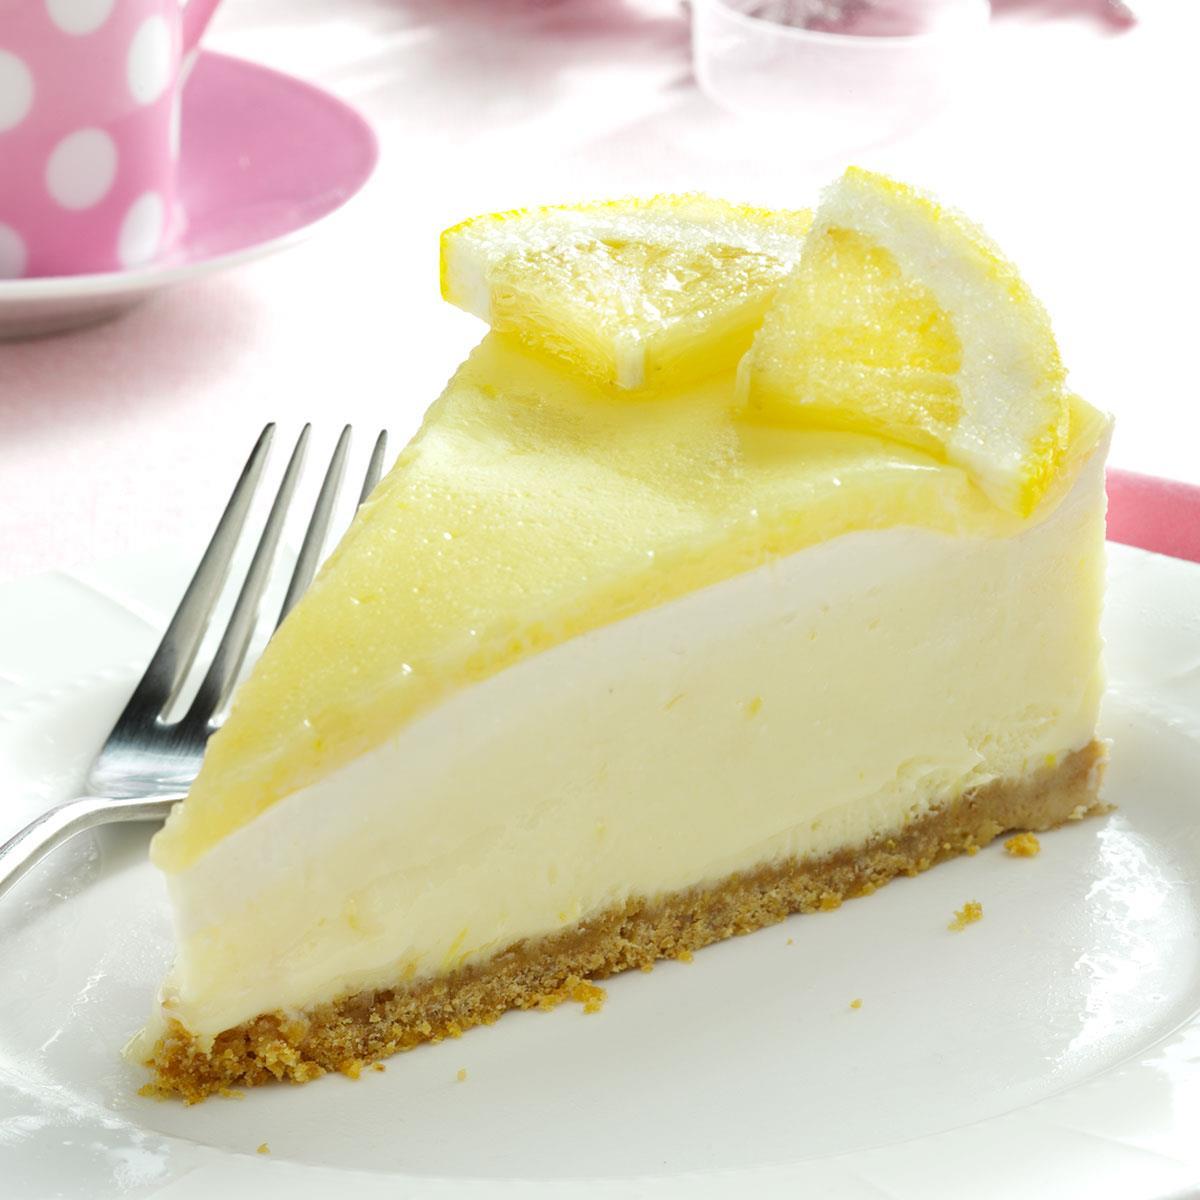 Creamy Lemon Cheesecake image